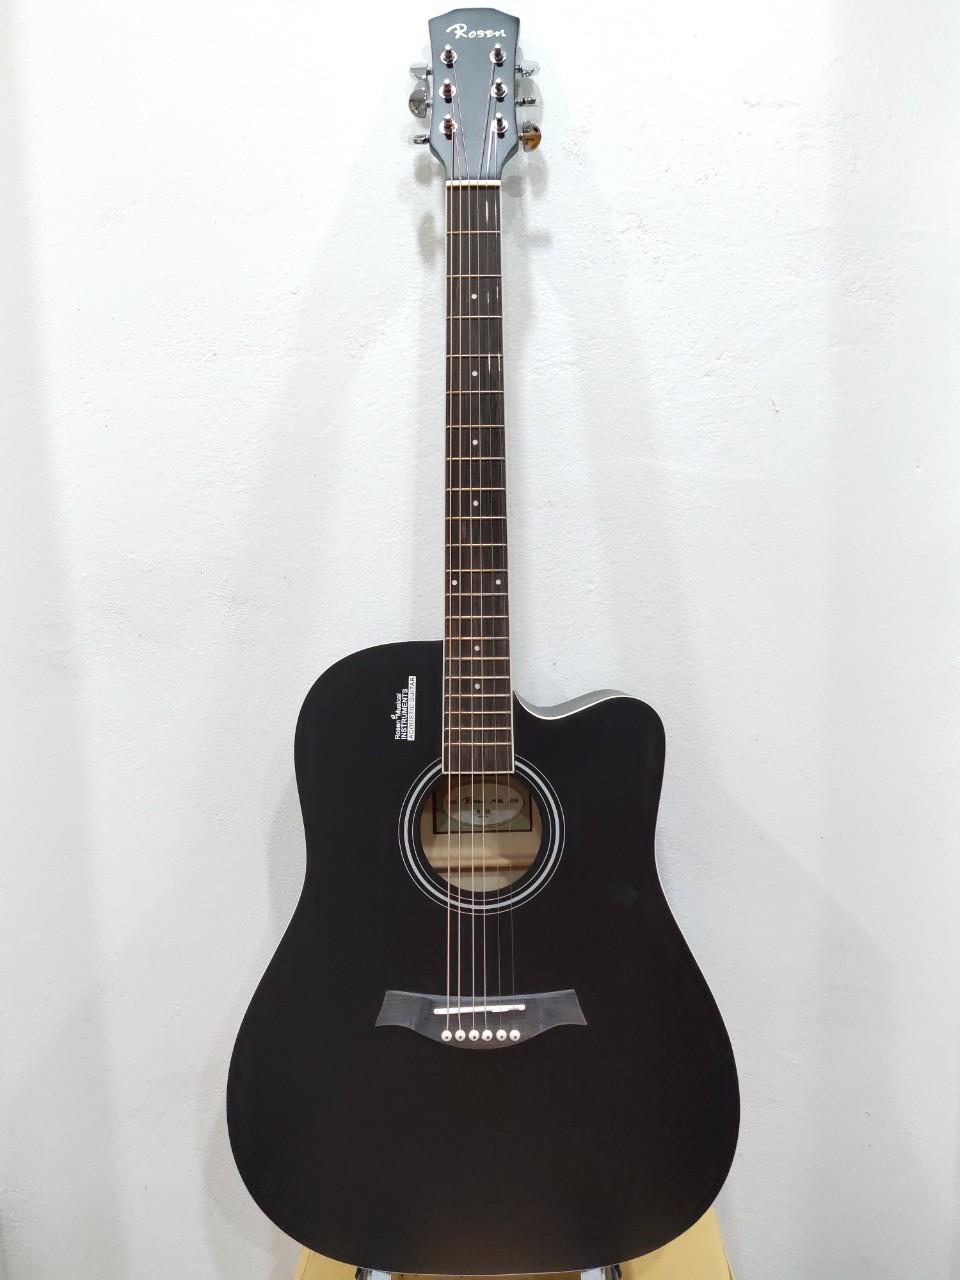 Đàn Guitar Acoustic Rosen R135 đen